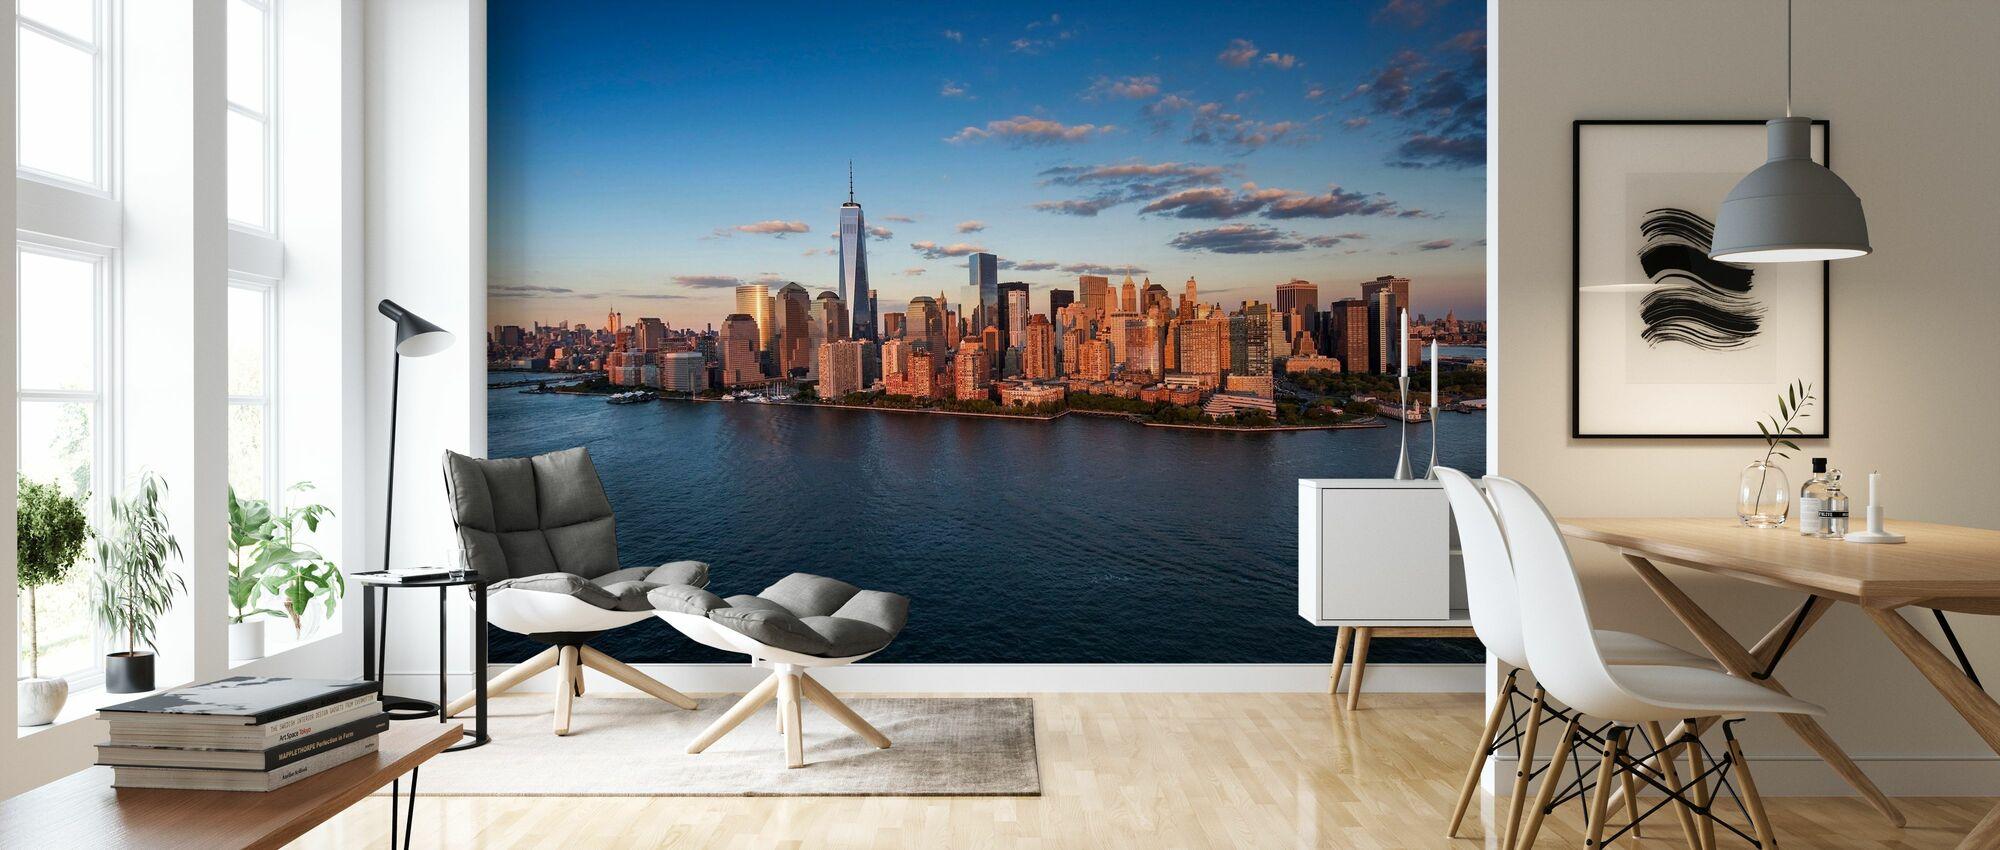 Freedom Tower - New York - Wallpaper - Living Room